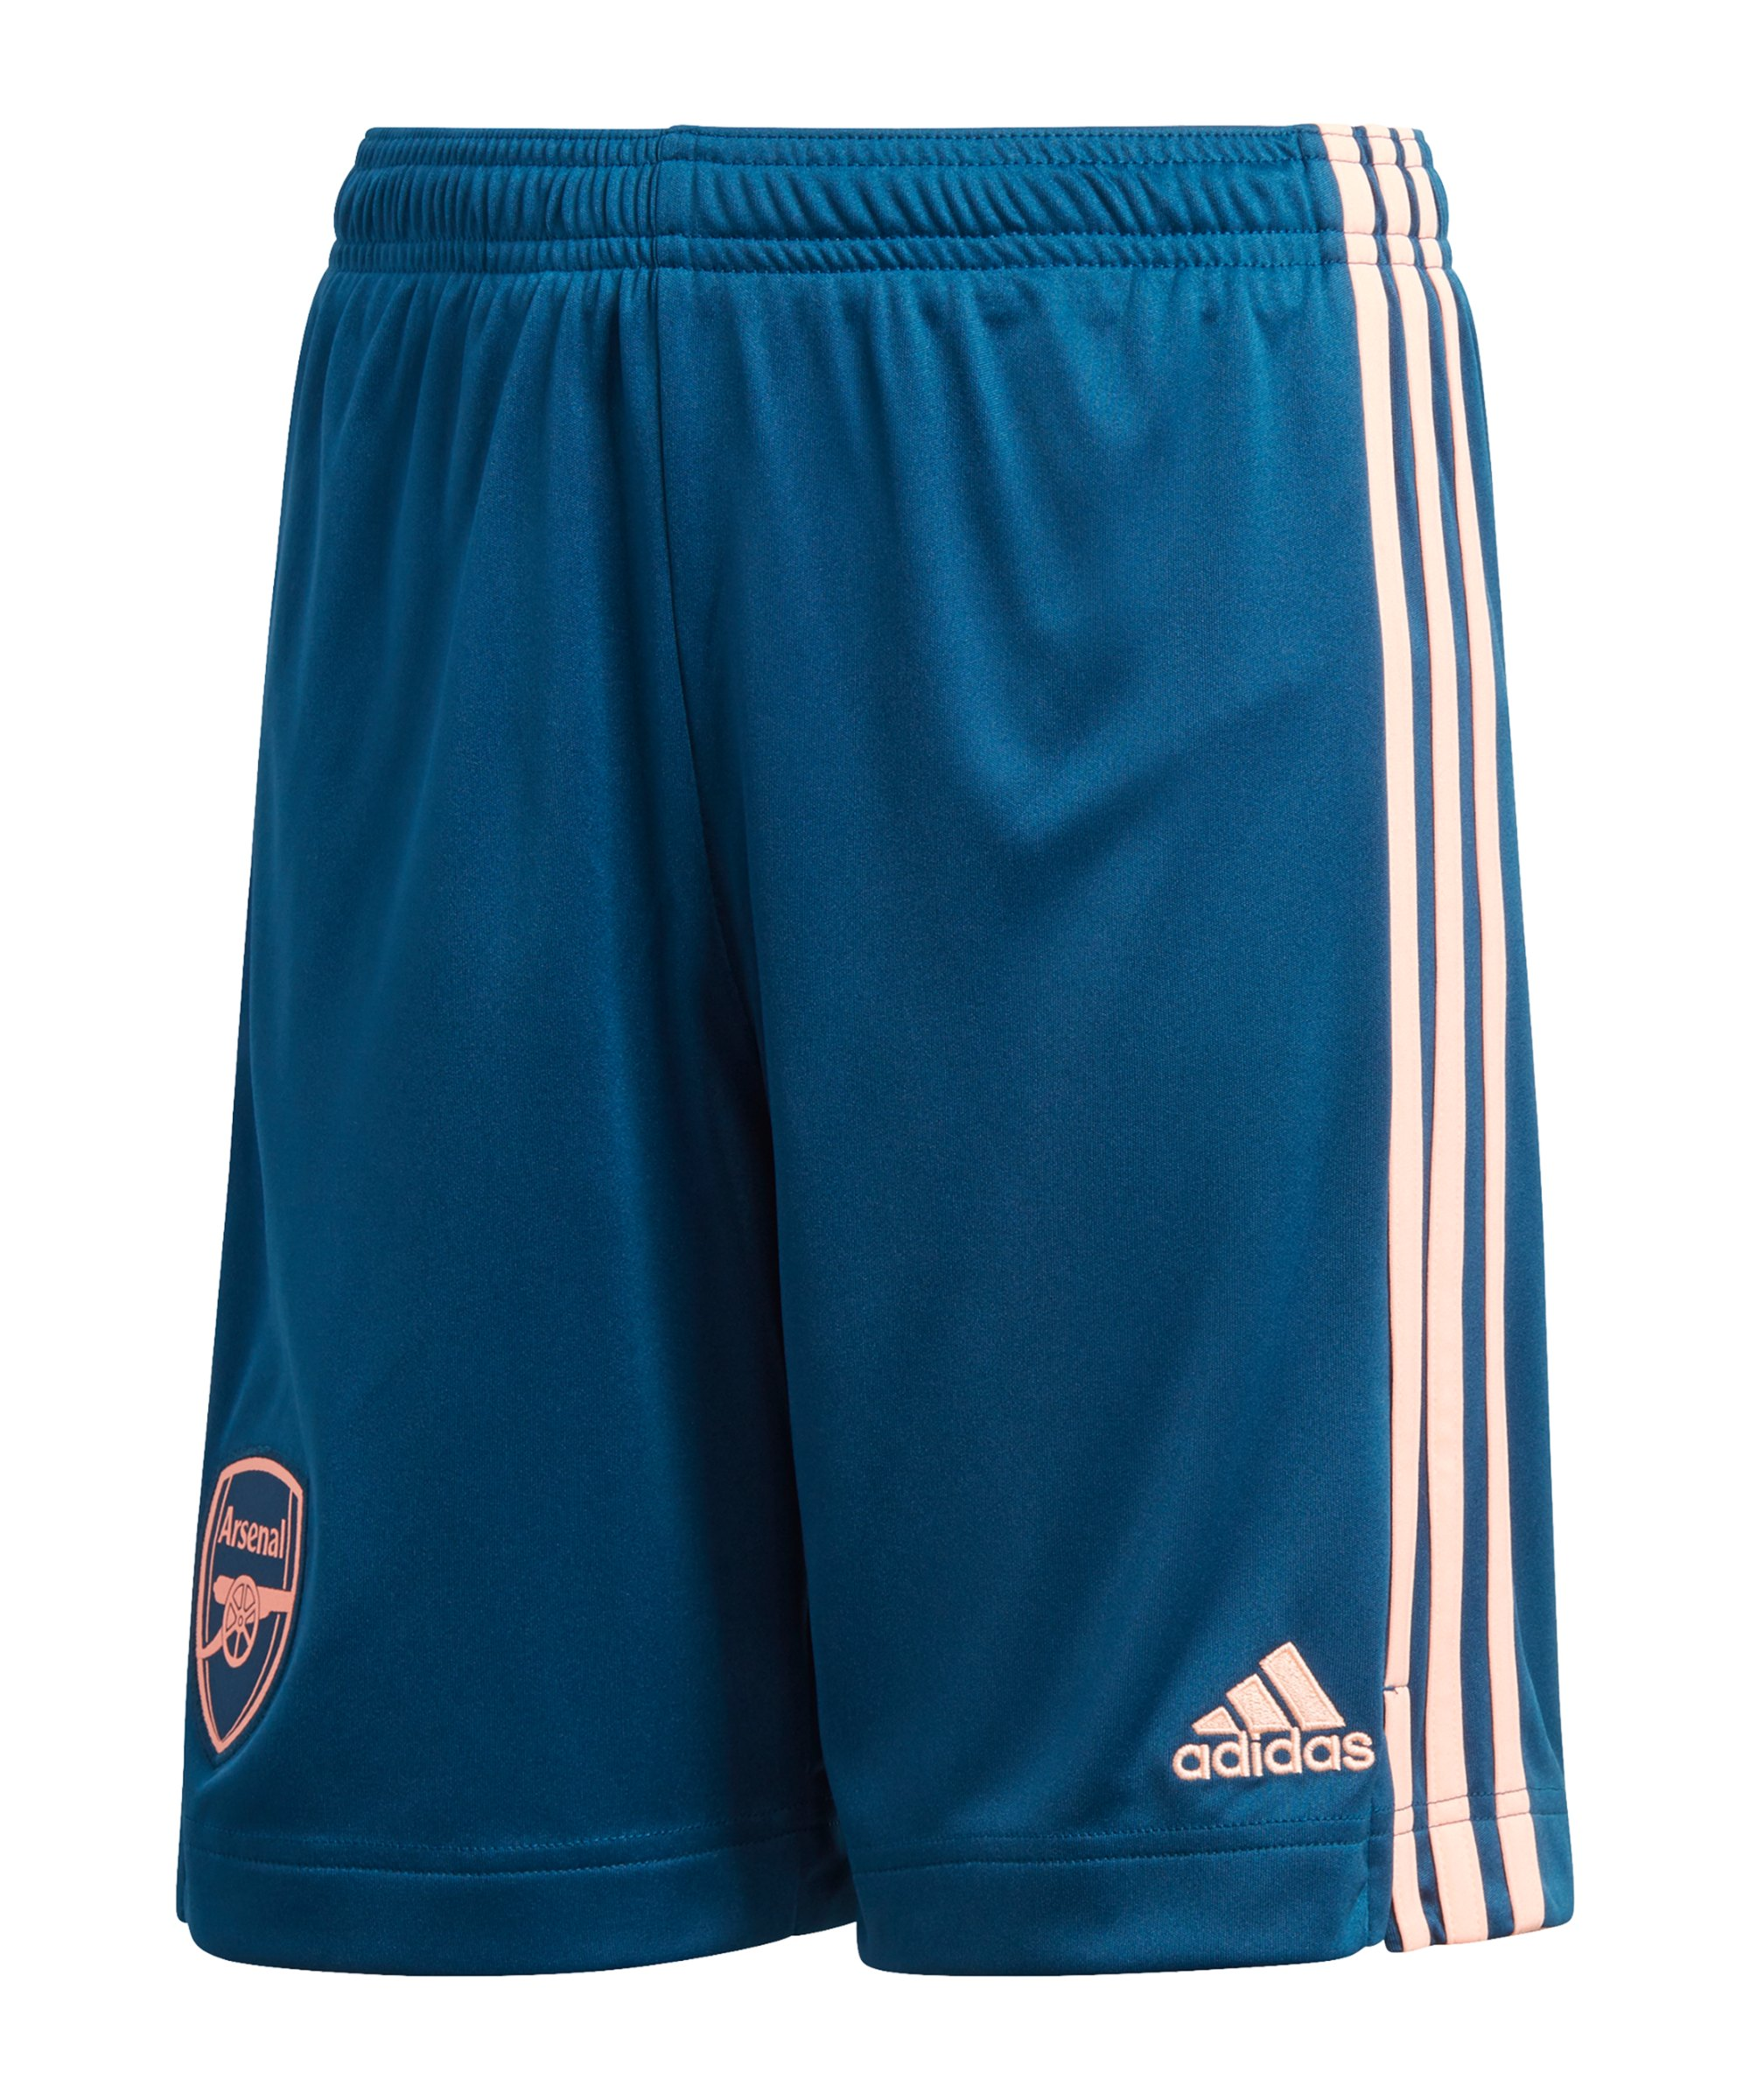 adidas FC Arsenal London 3rd Short 2020/2021 Kids - blau